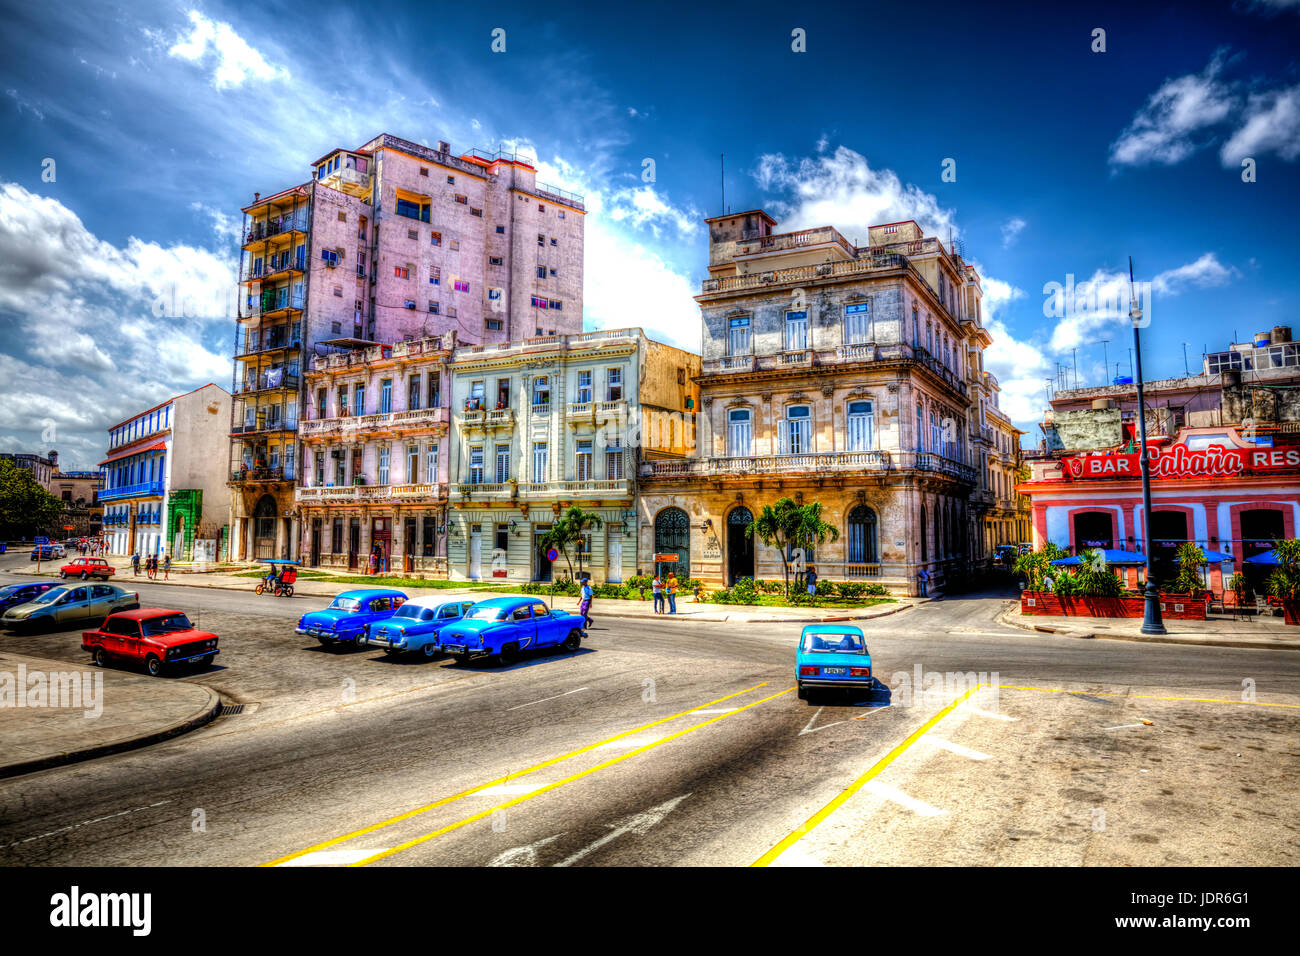 Havana city, Havana cuba, Havana streets Cuba, Cuban city, Cuban cities, Havana Cuba, Havana, Cuba, old Havana, - Stock Image